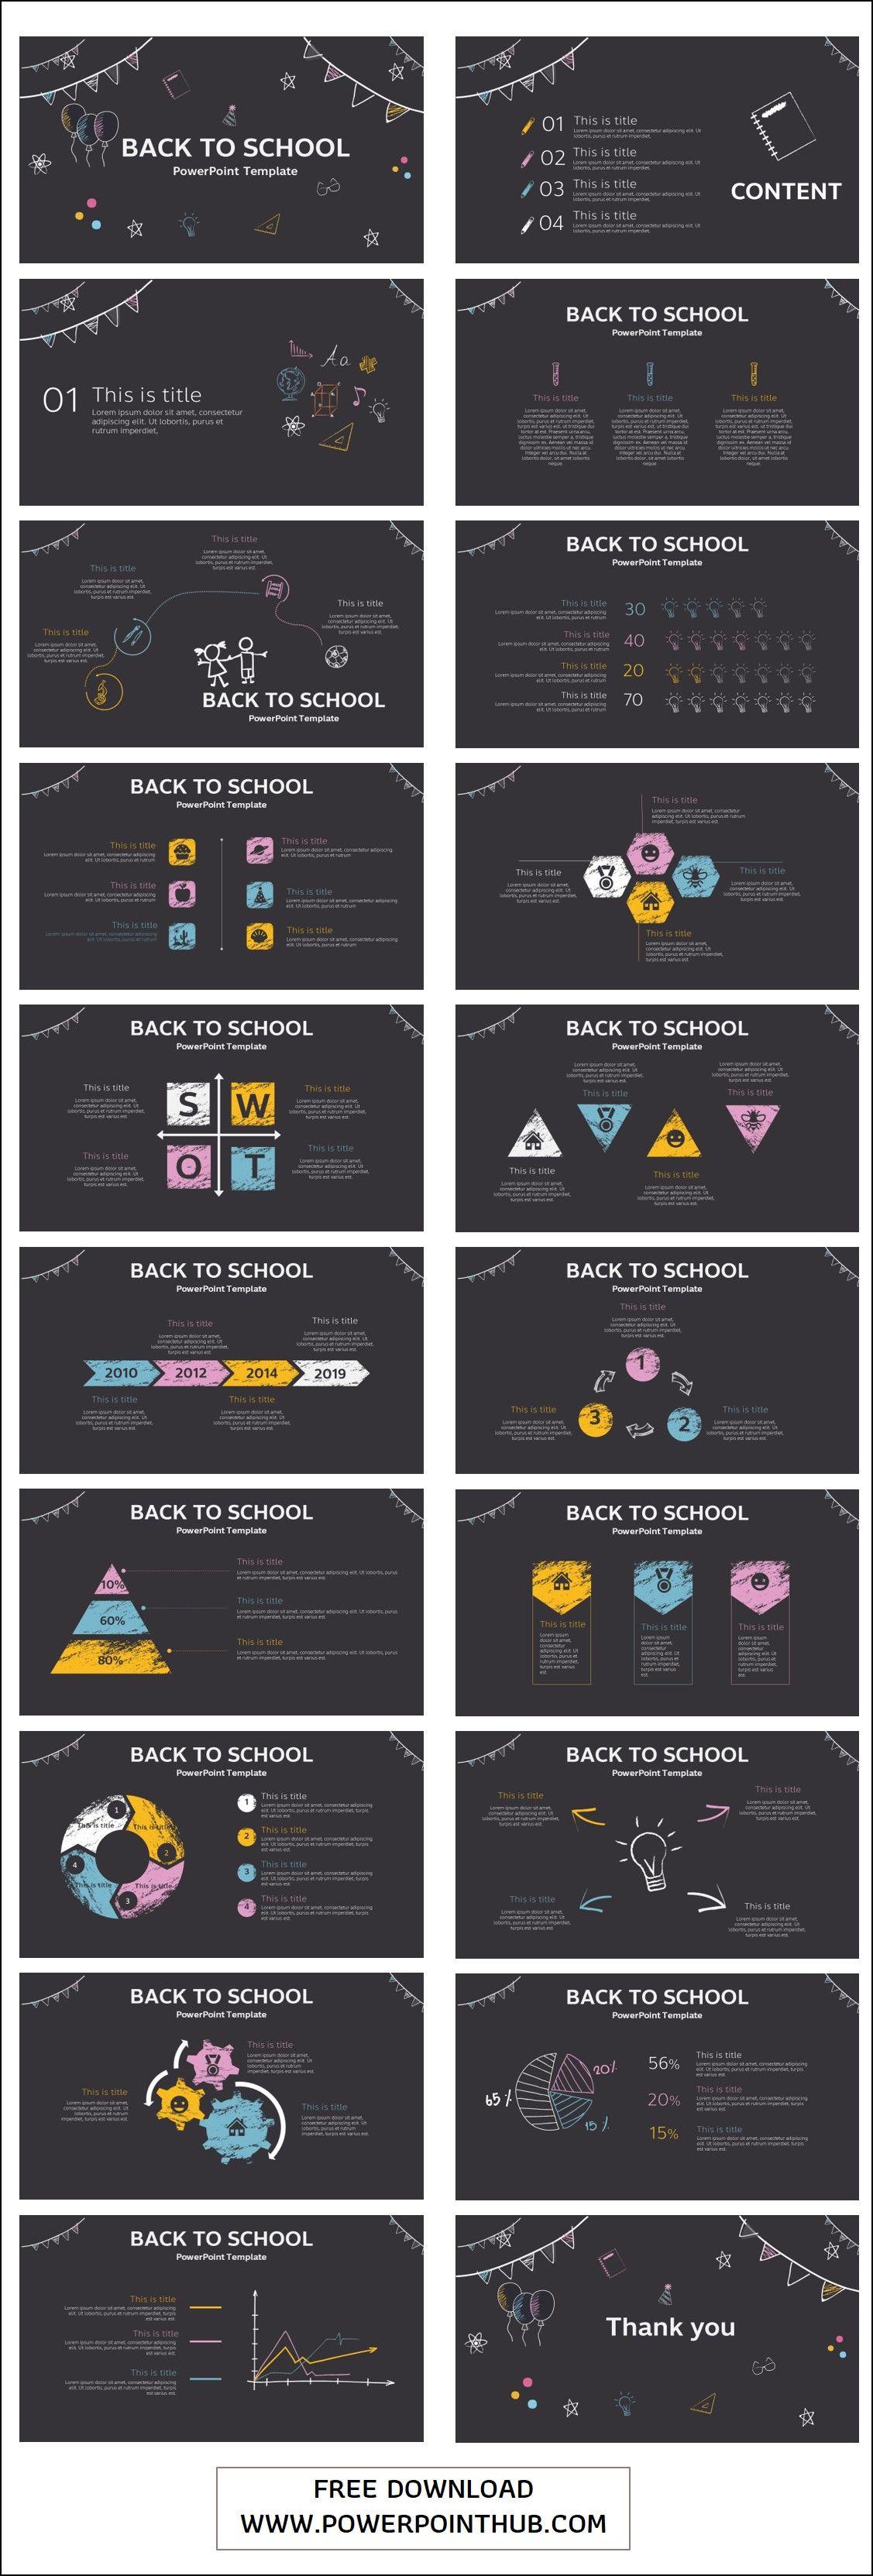 Back to school PowerPoint Template Desain